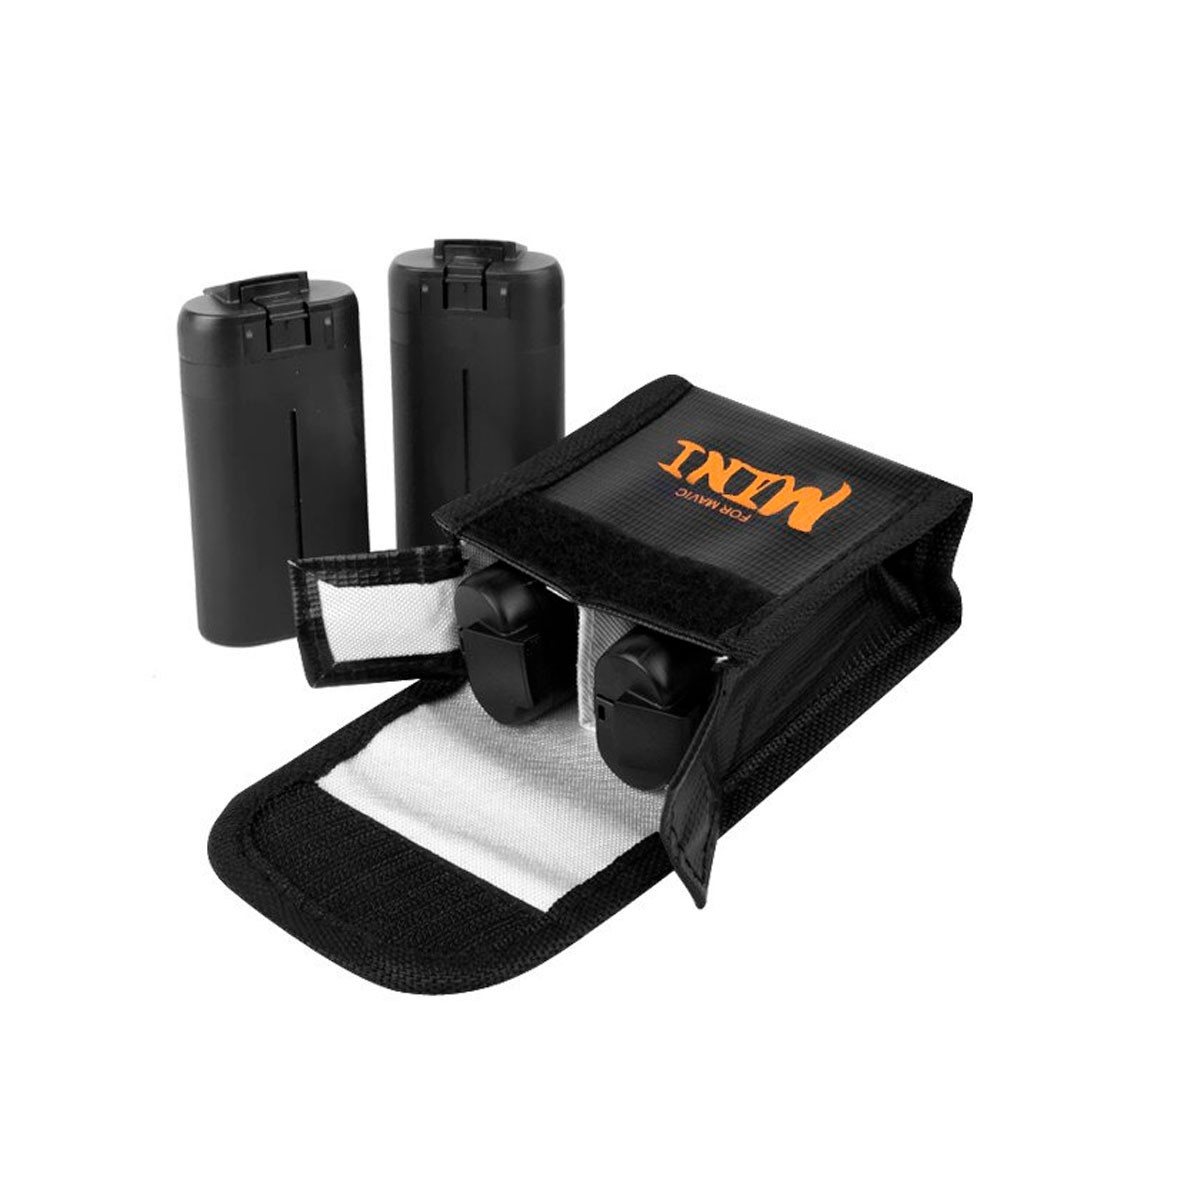 Saco Anti Chama e Explosão para Bateria - Drone DJI Mavic Mini - 2 Baterias